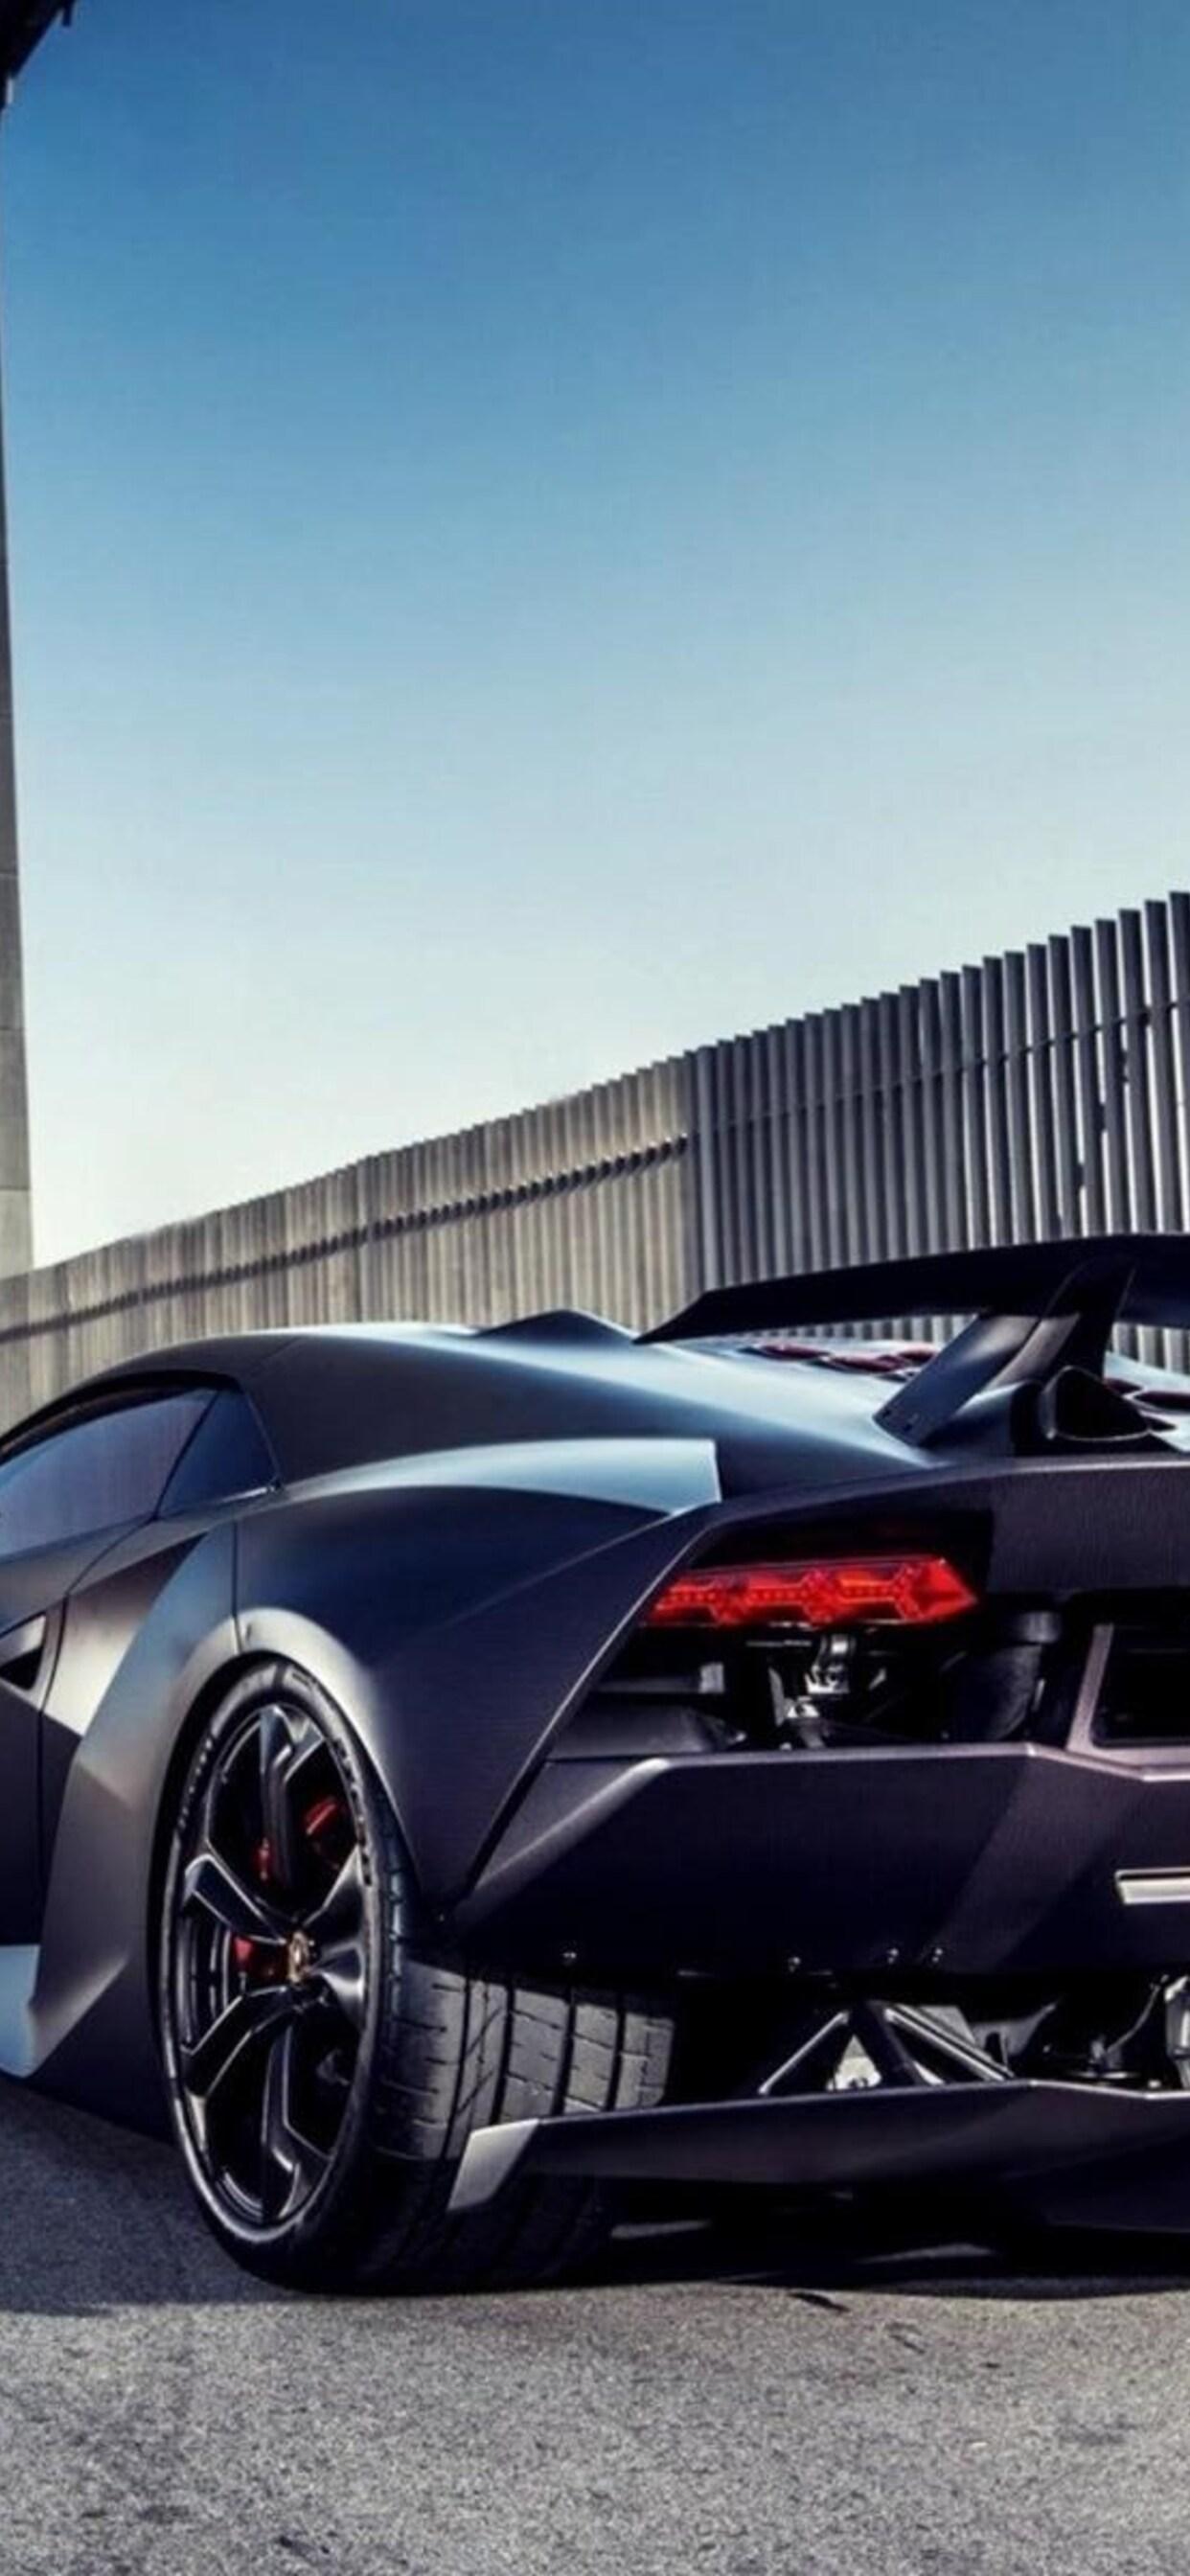 1242x2688 Lamborghini Sesto Elemento Iphone Xs Max Hd 4k Wallpapers